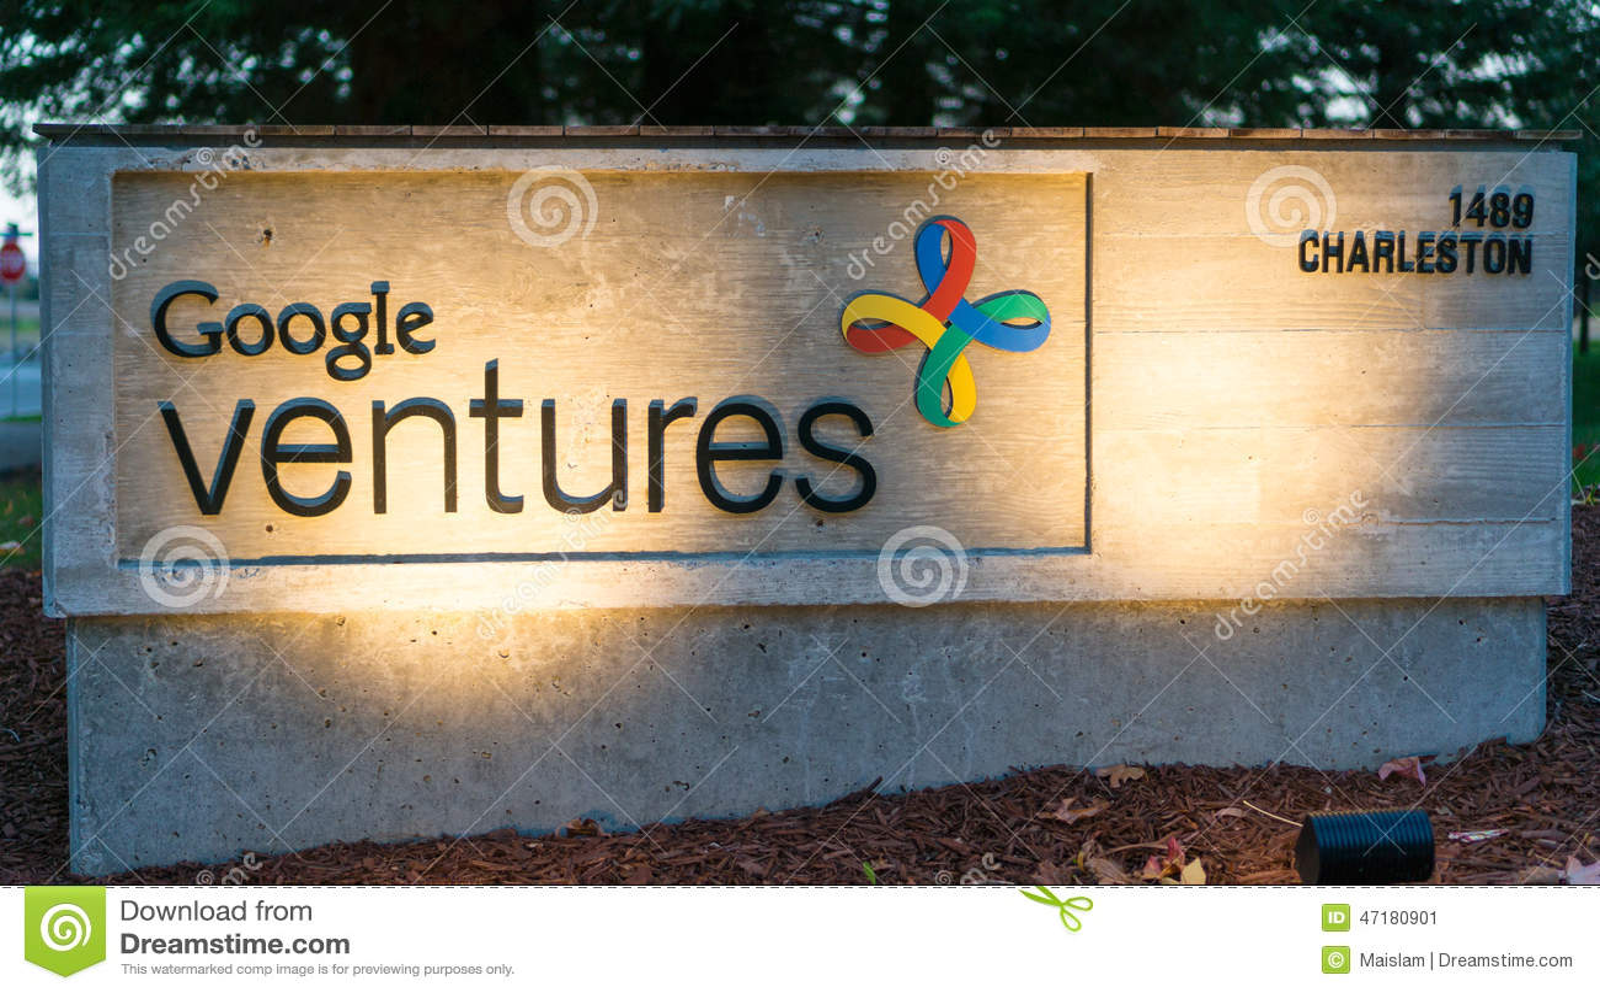 Google ventures theme - Exterior View Of Google Ventures Office Stock Image